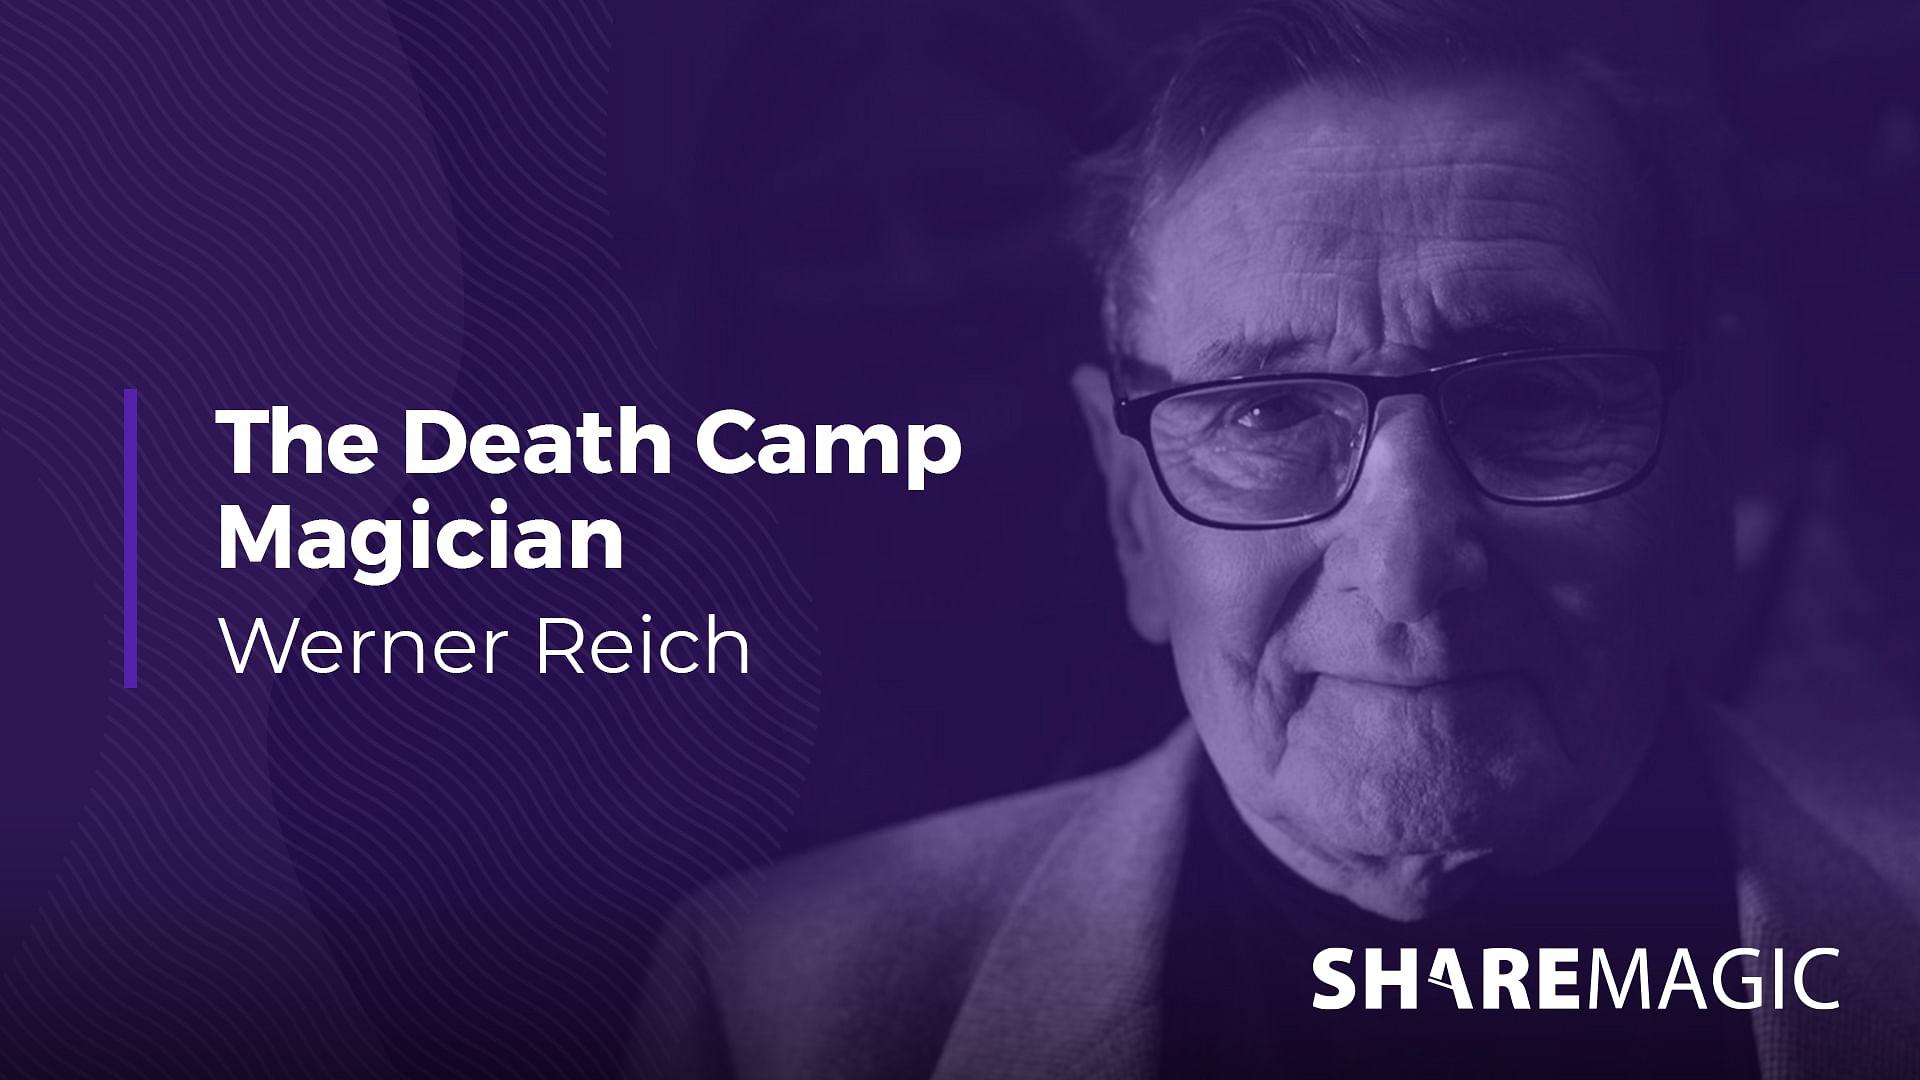 ShareMagic: The Death Camp Magician